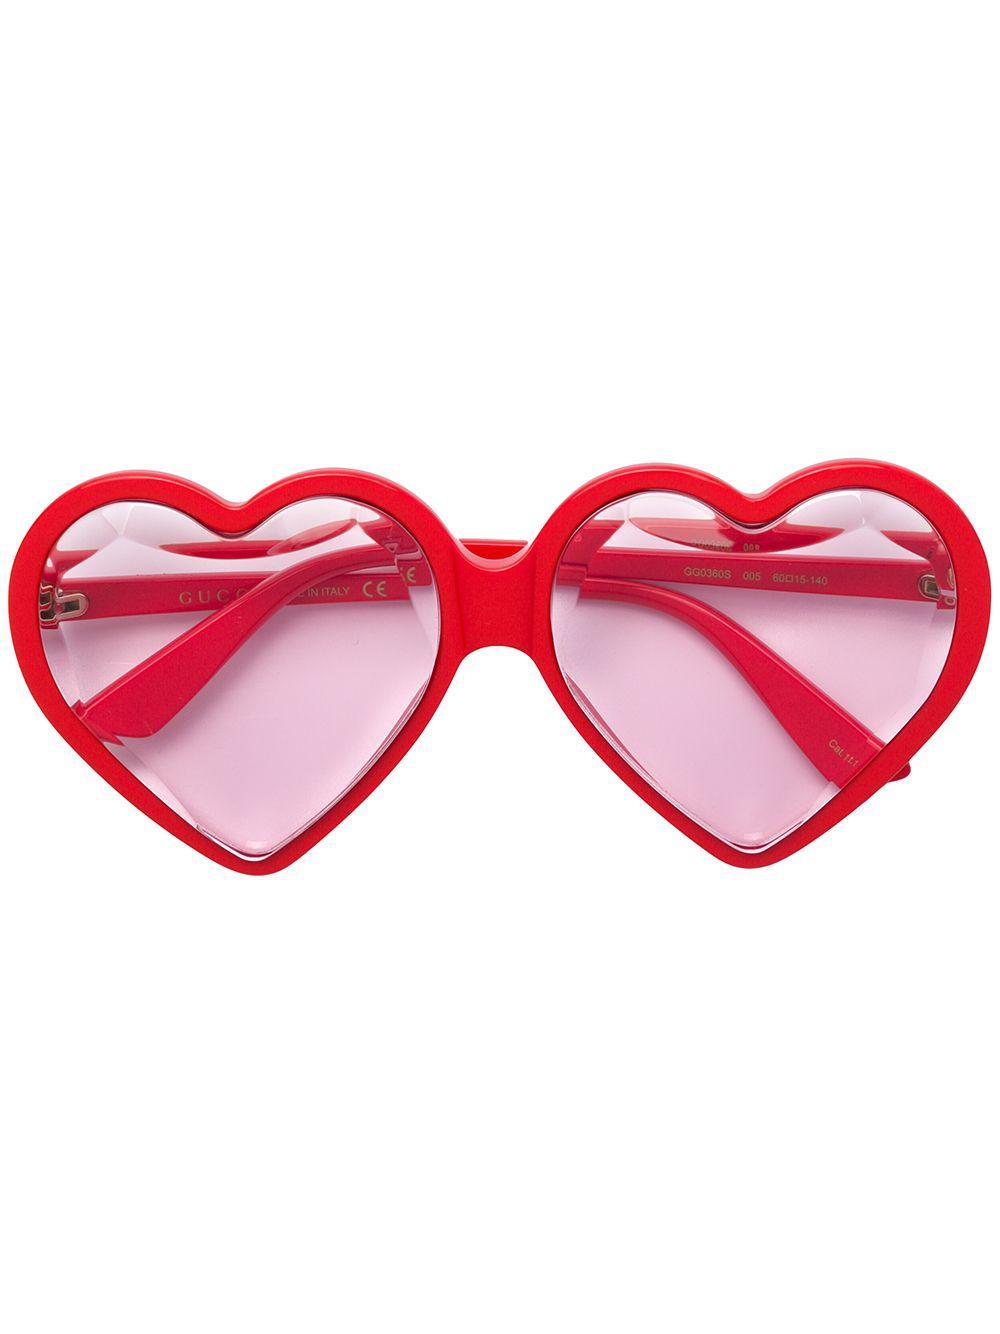 6724b9f136 Lyst - Gucci Love Heart Sunglasses in Red